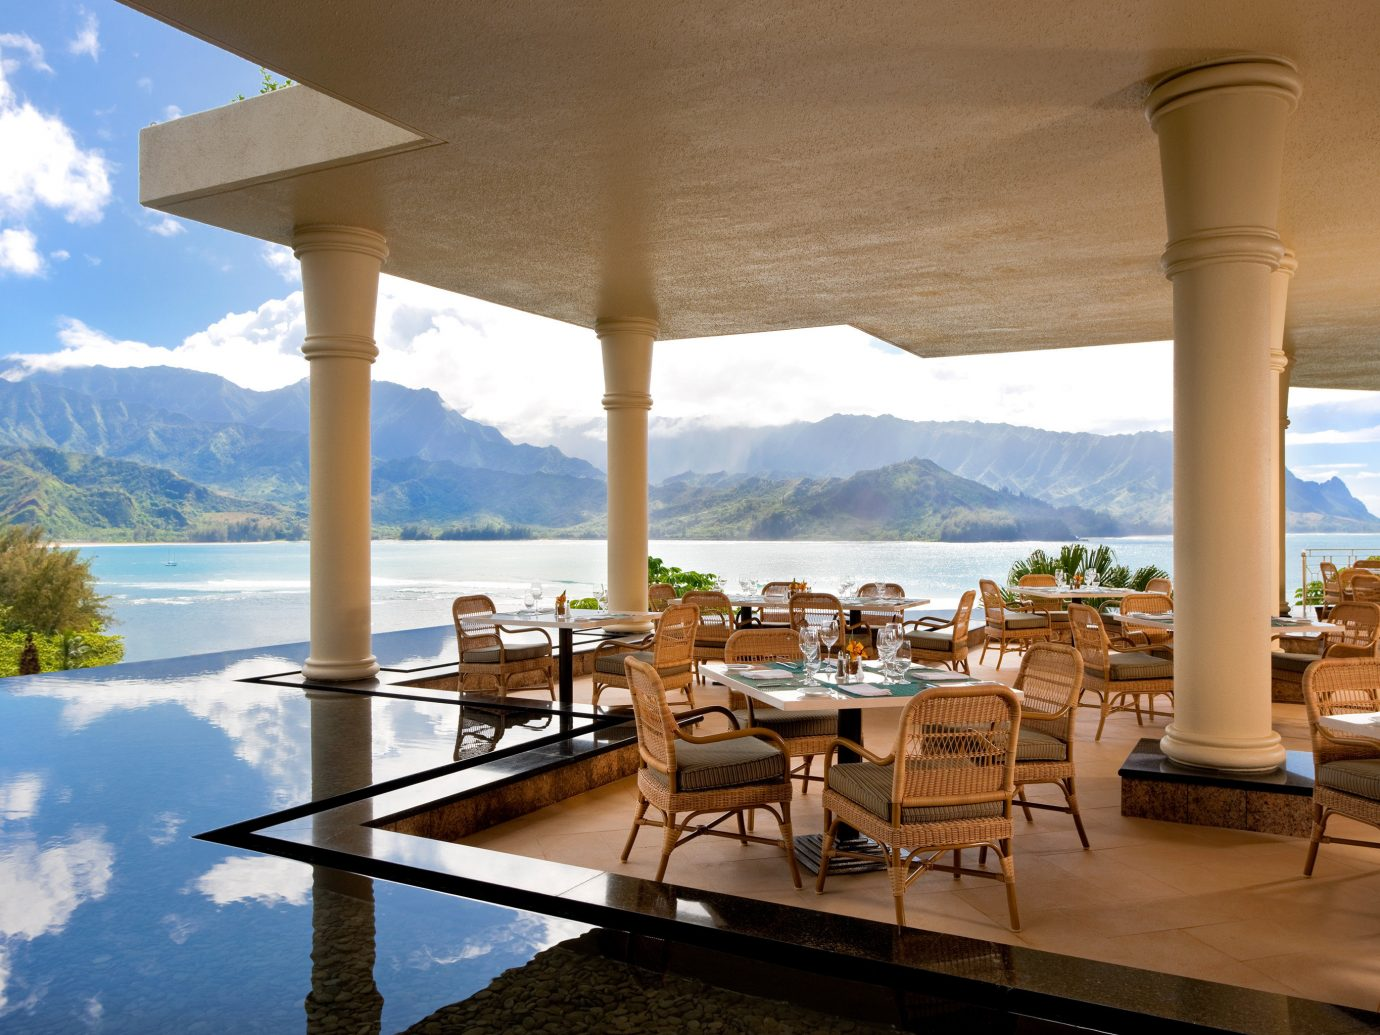 Beachfront Lounge Luxury Modern Pool Trip Ideas sky leisure outdoor vacation estate Resort house Architecture home Villa wood interior design overlooking furniture Island